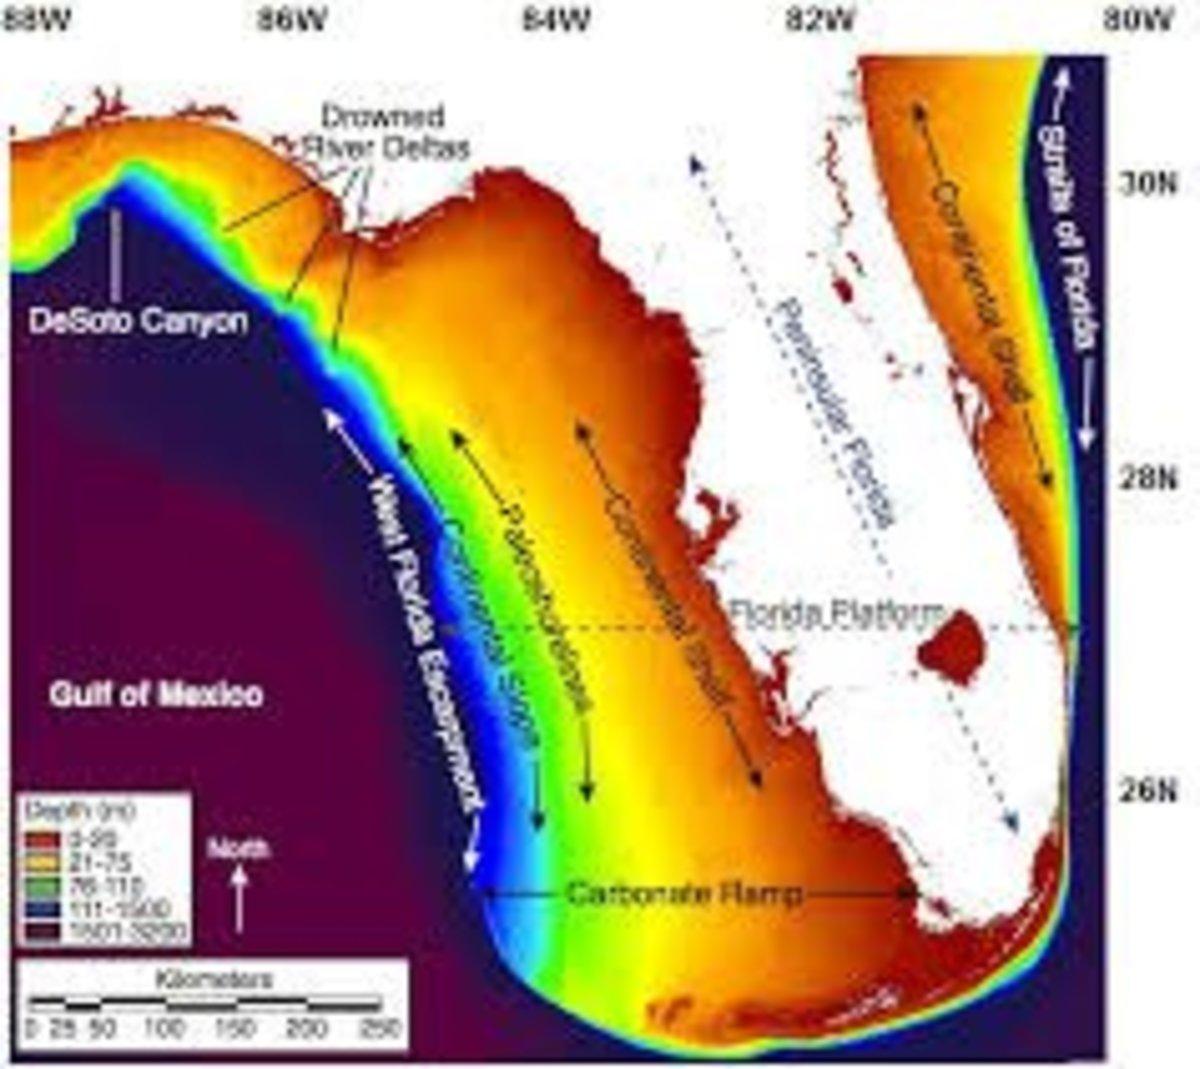 Prehistoric Florida, 12,000 years ago